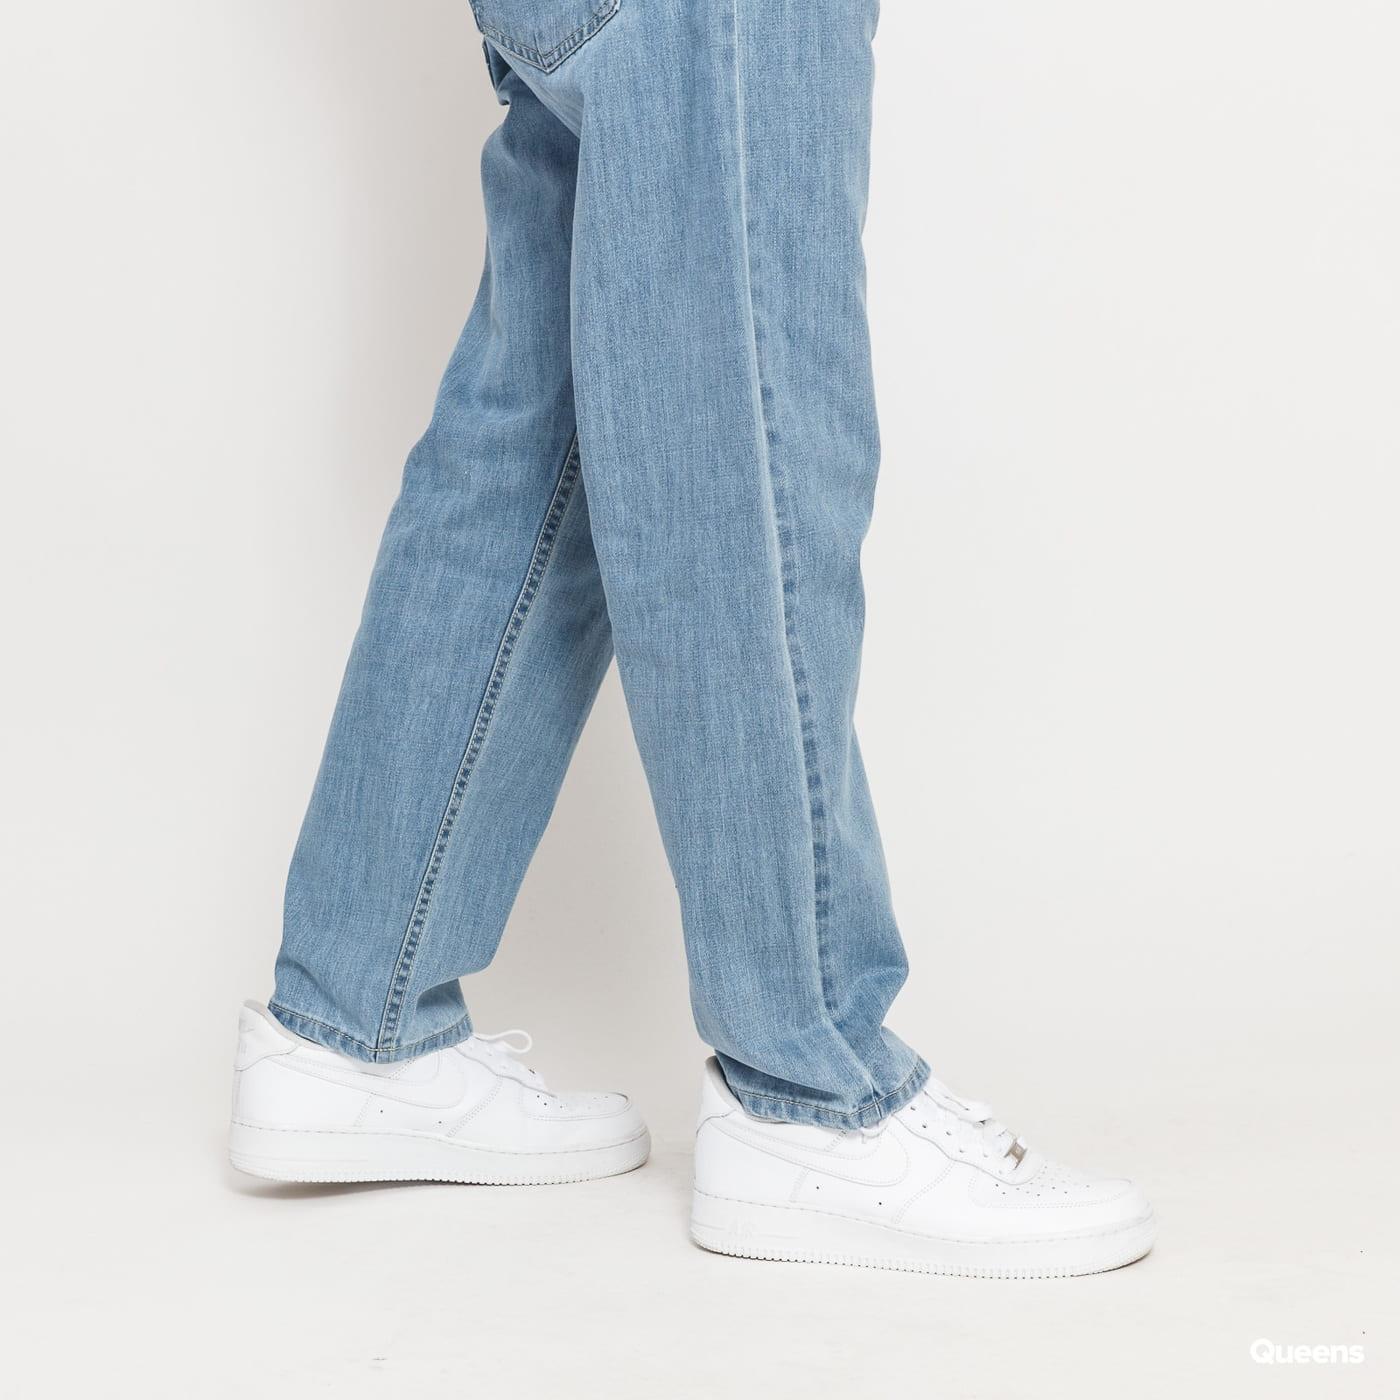 Mass DNM Slang Baggy Fit Jeans light blue